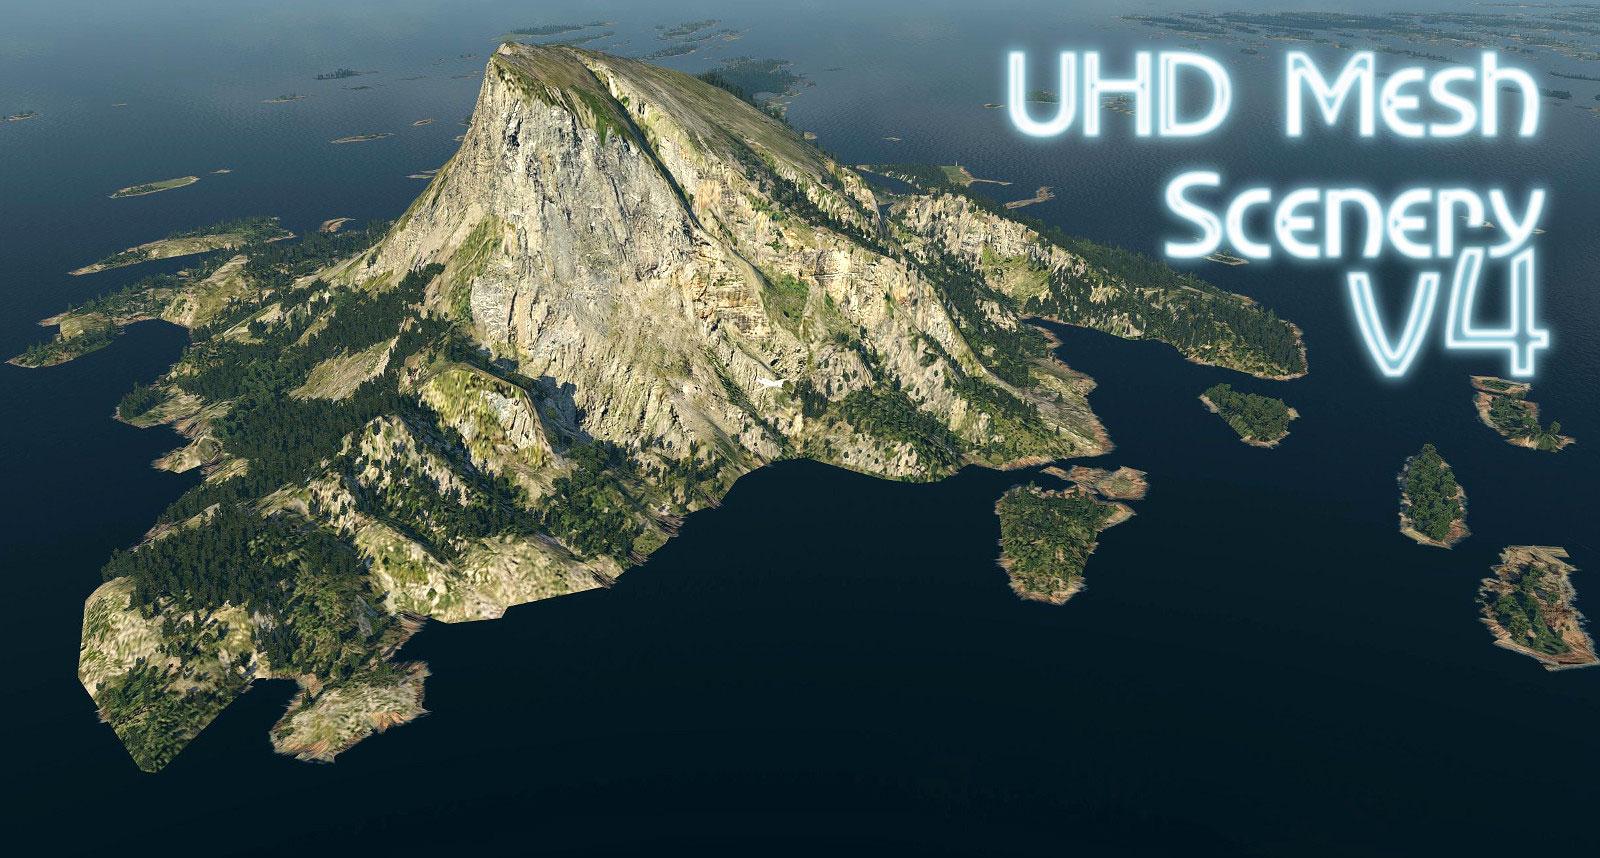 UHD Mesh Scenery v4 Downloads for X-Plane 11